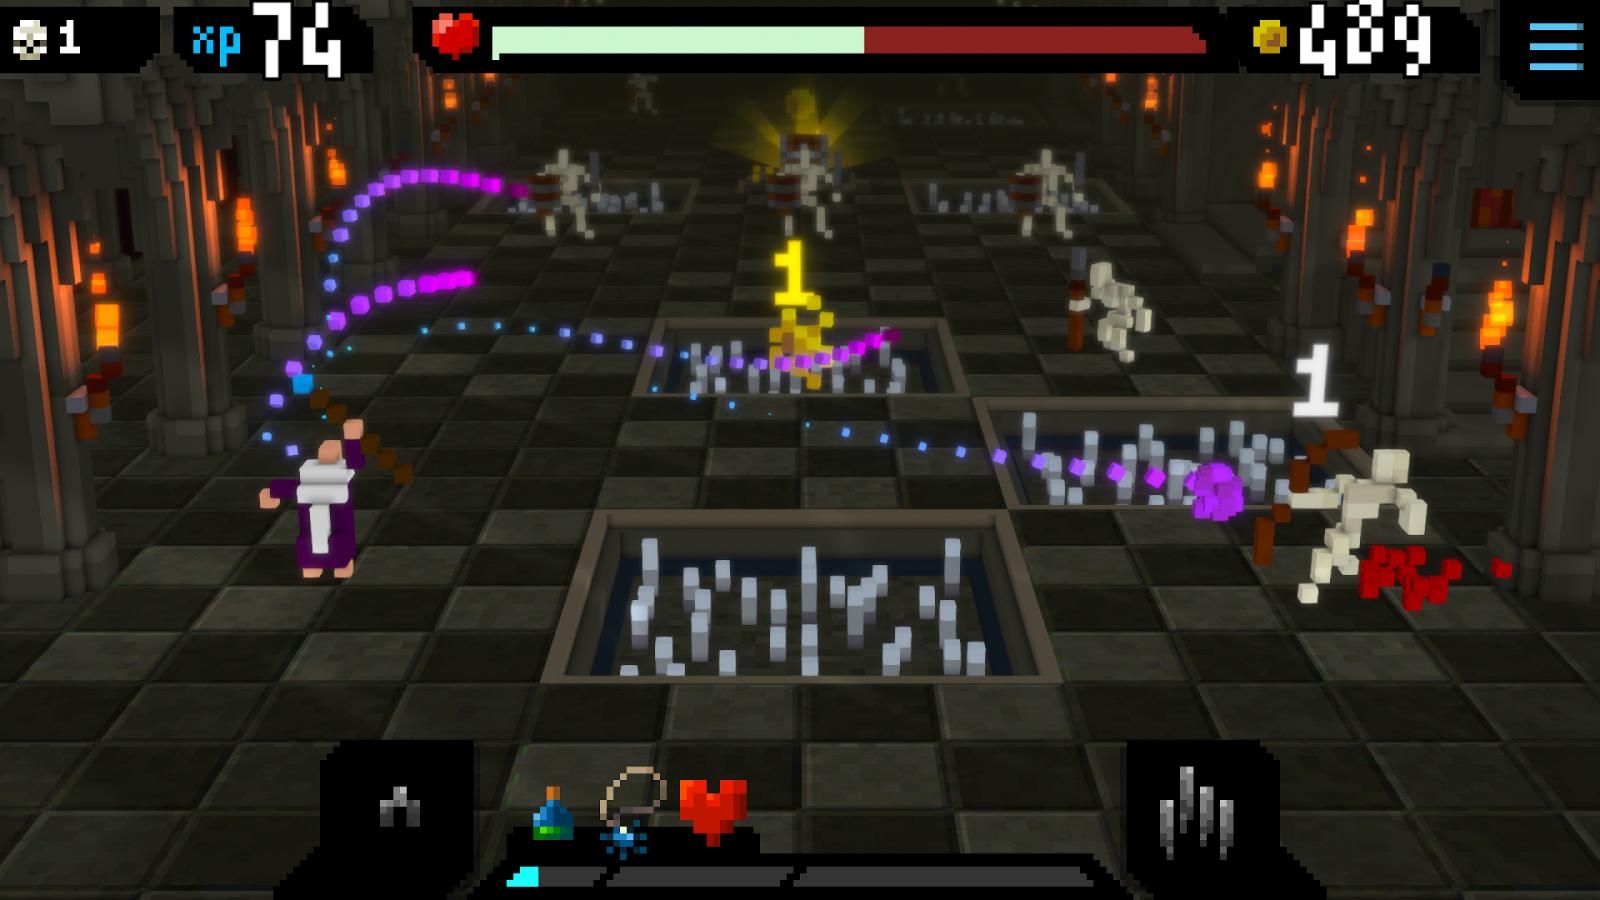 nY3hMqGdjC5uYpnQ8jpDp9 - The best free Android games 2018